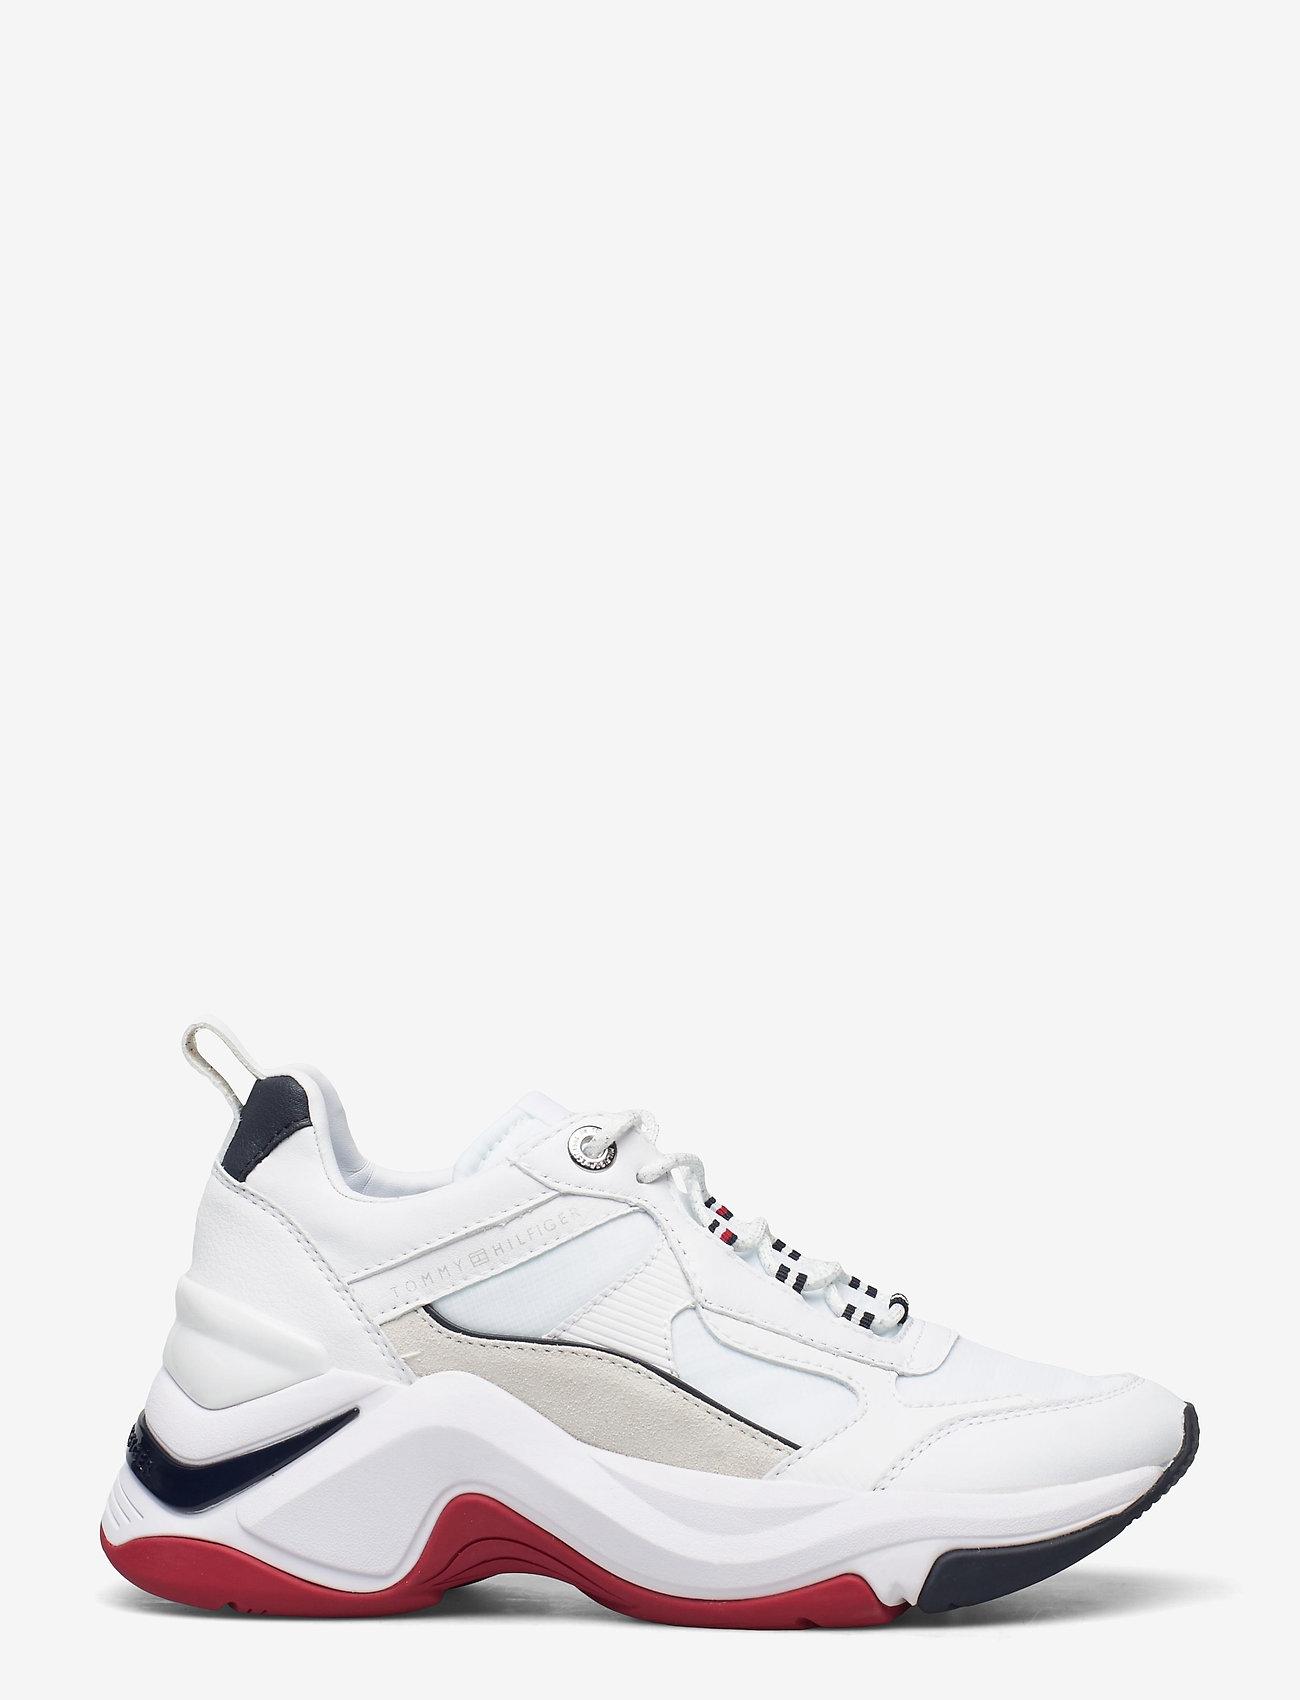 Tommy Hilfiger - FASHION WEDGE SNEAKER - sneakers - rwb - 1